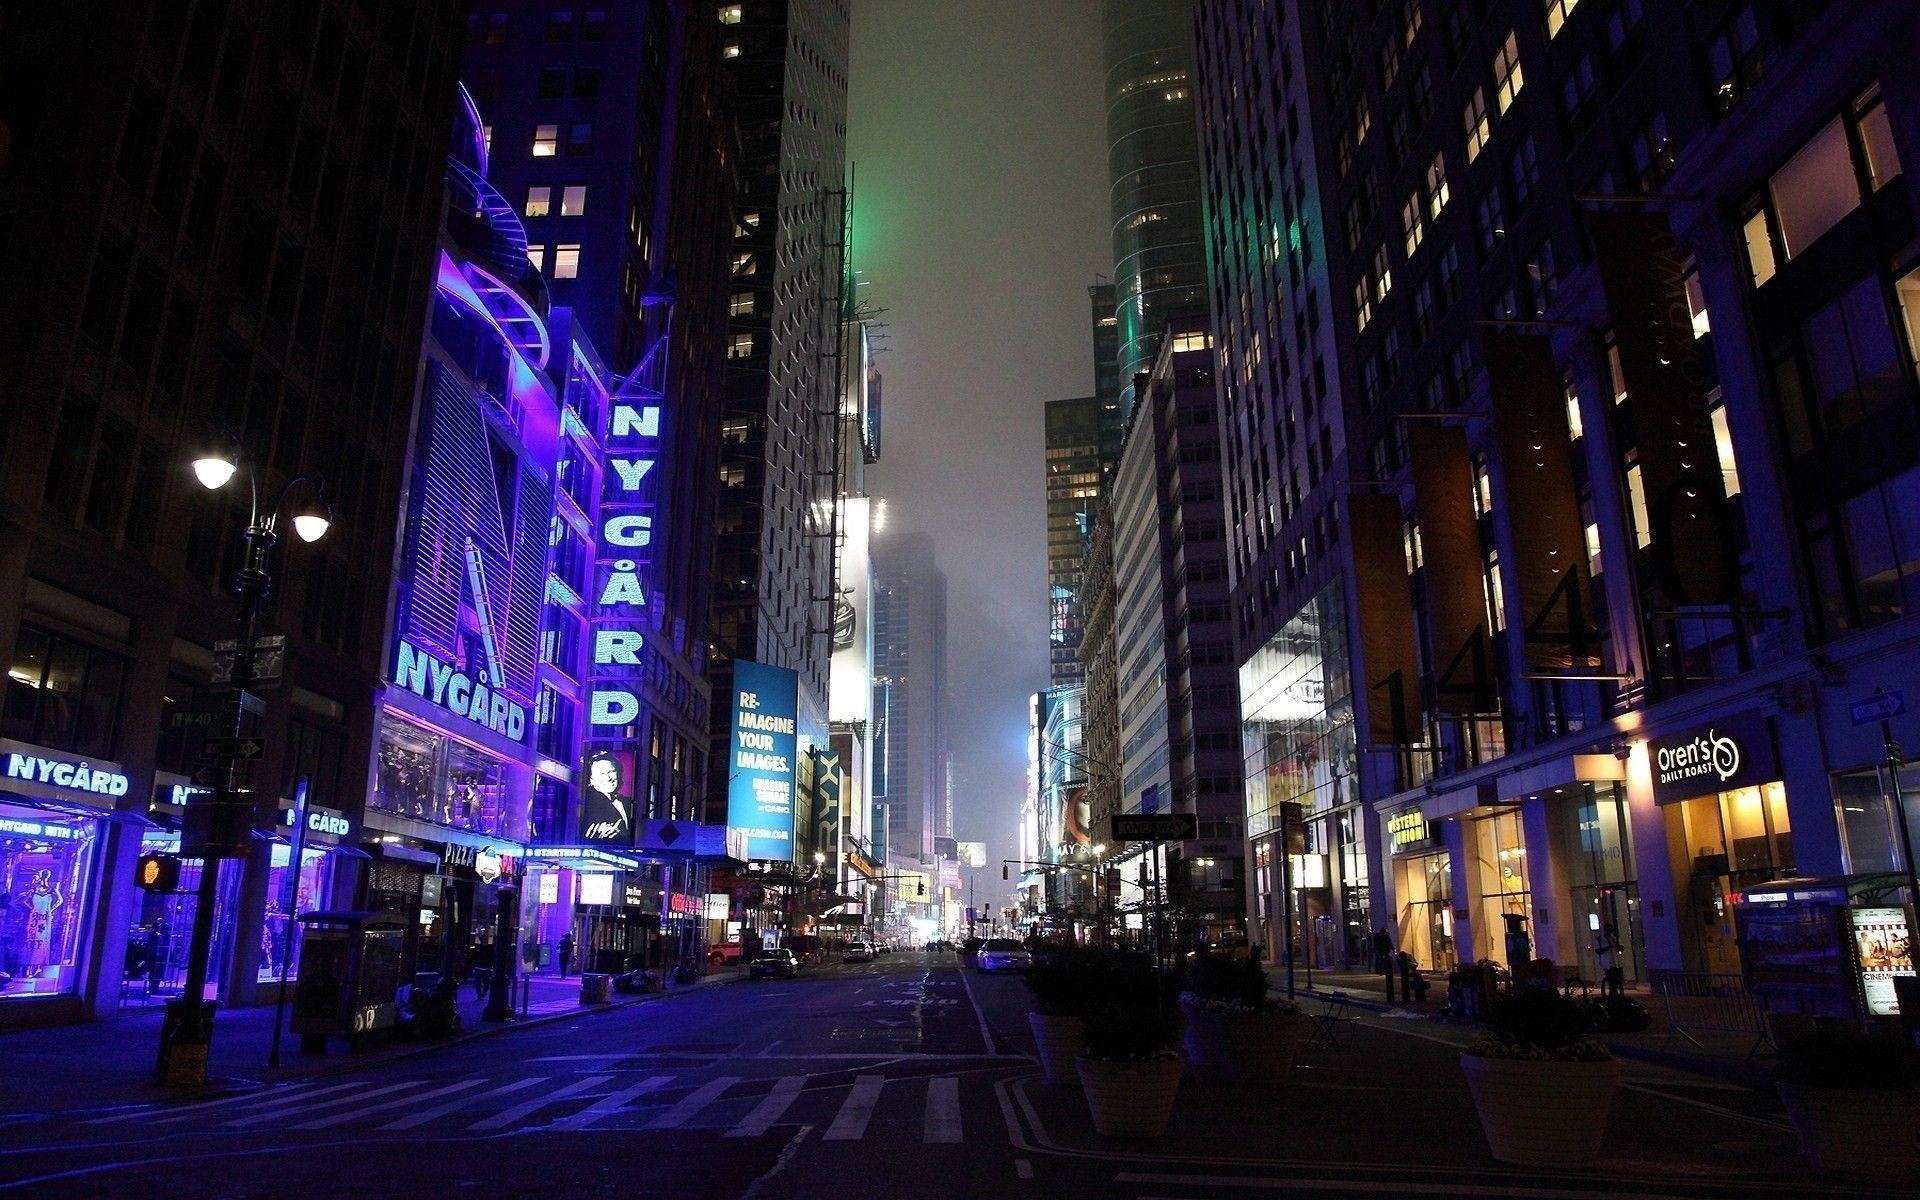 Download Wallpaper City??, Night, City lights, Street .